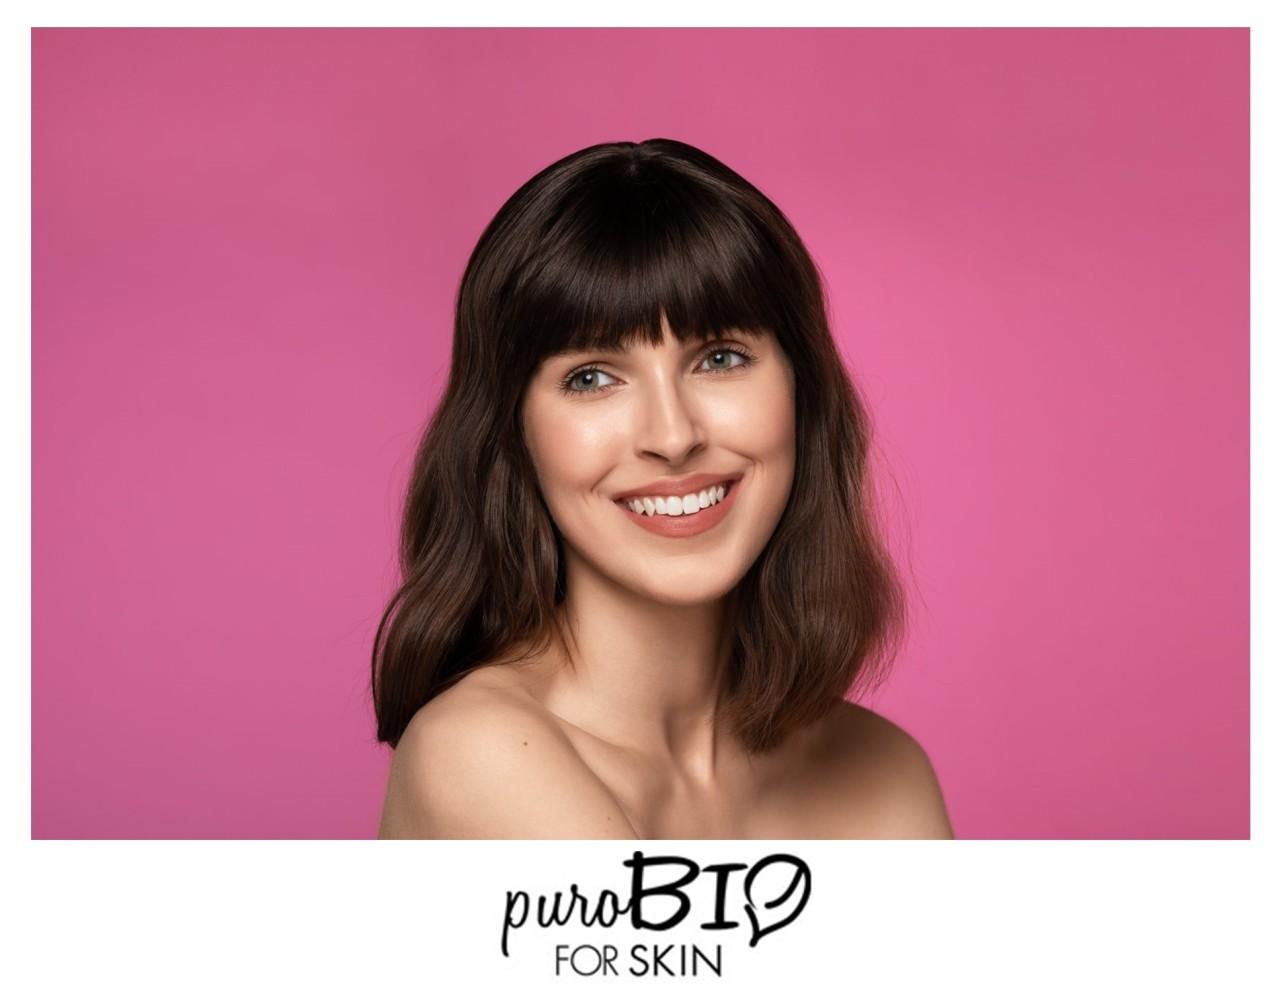 Noel Raczyńska for PuroBio Skin Campaign 2019